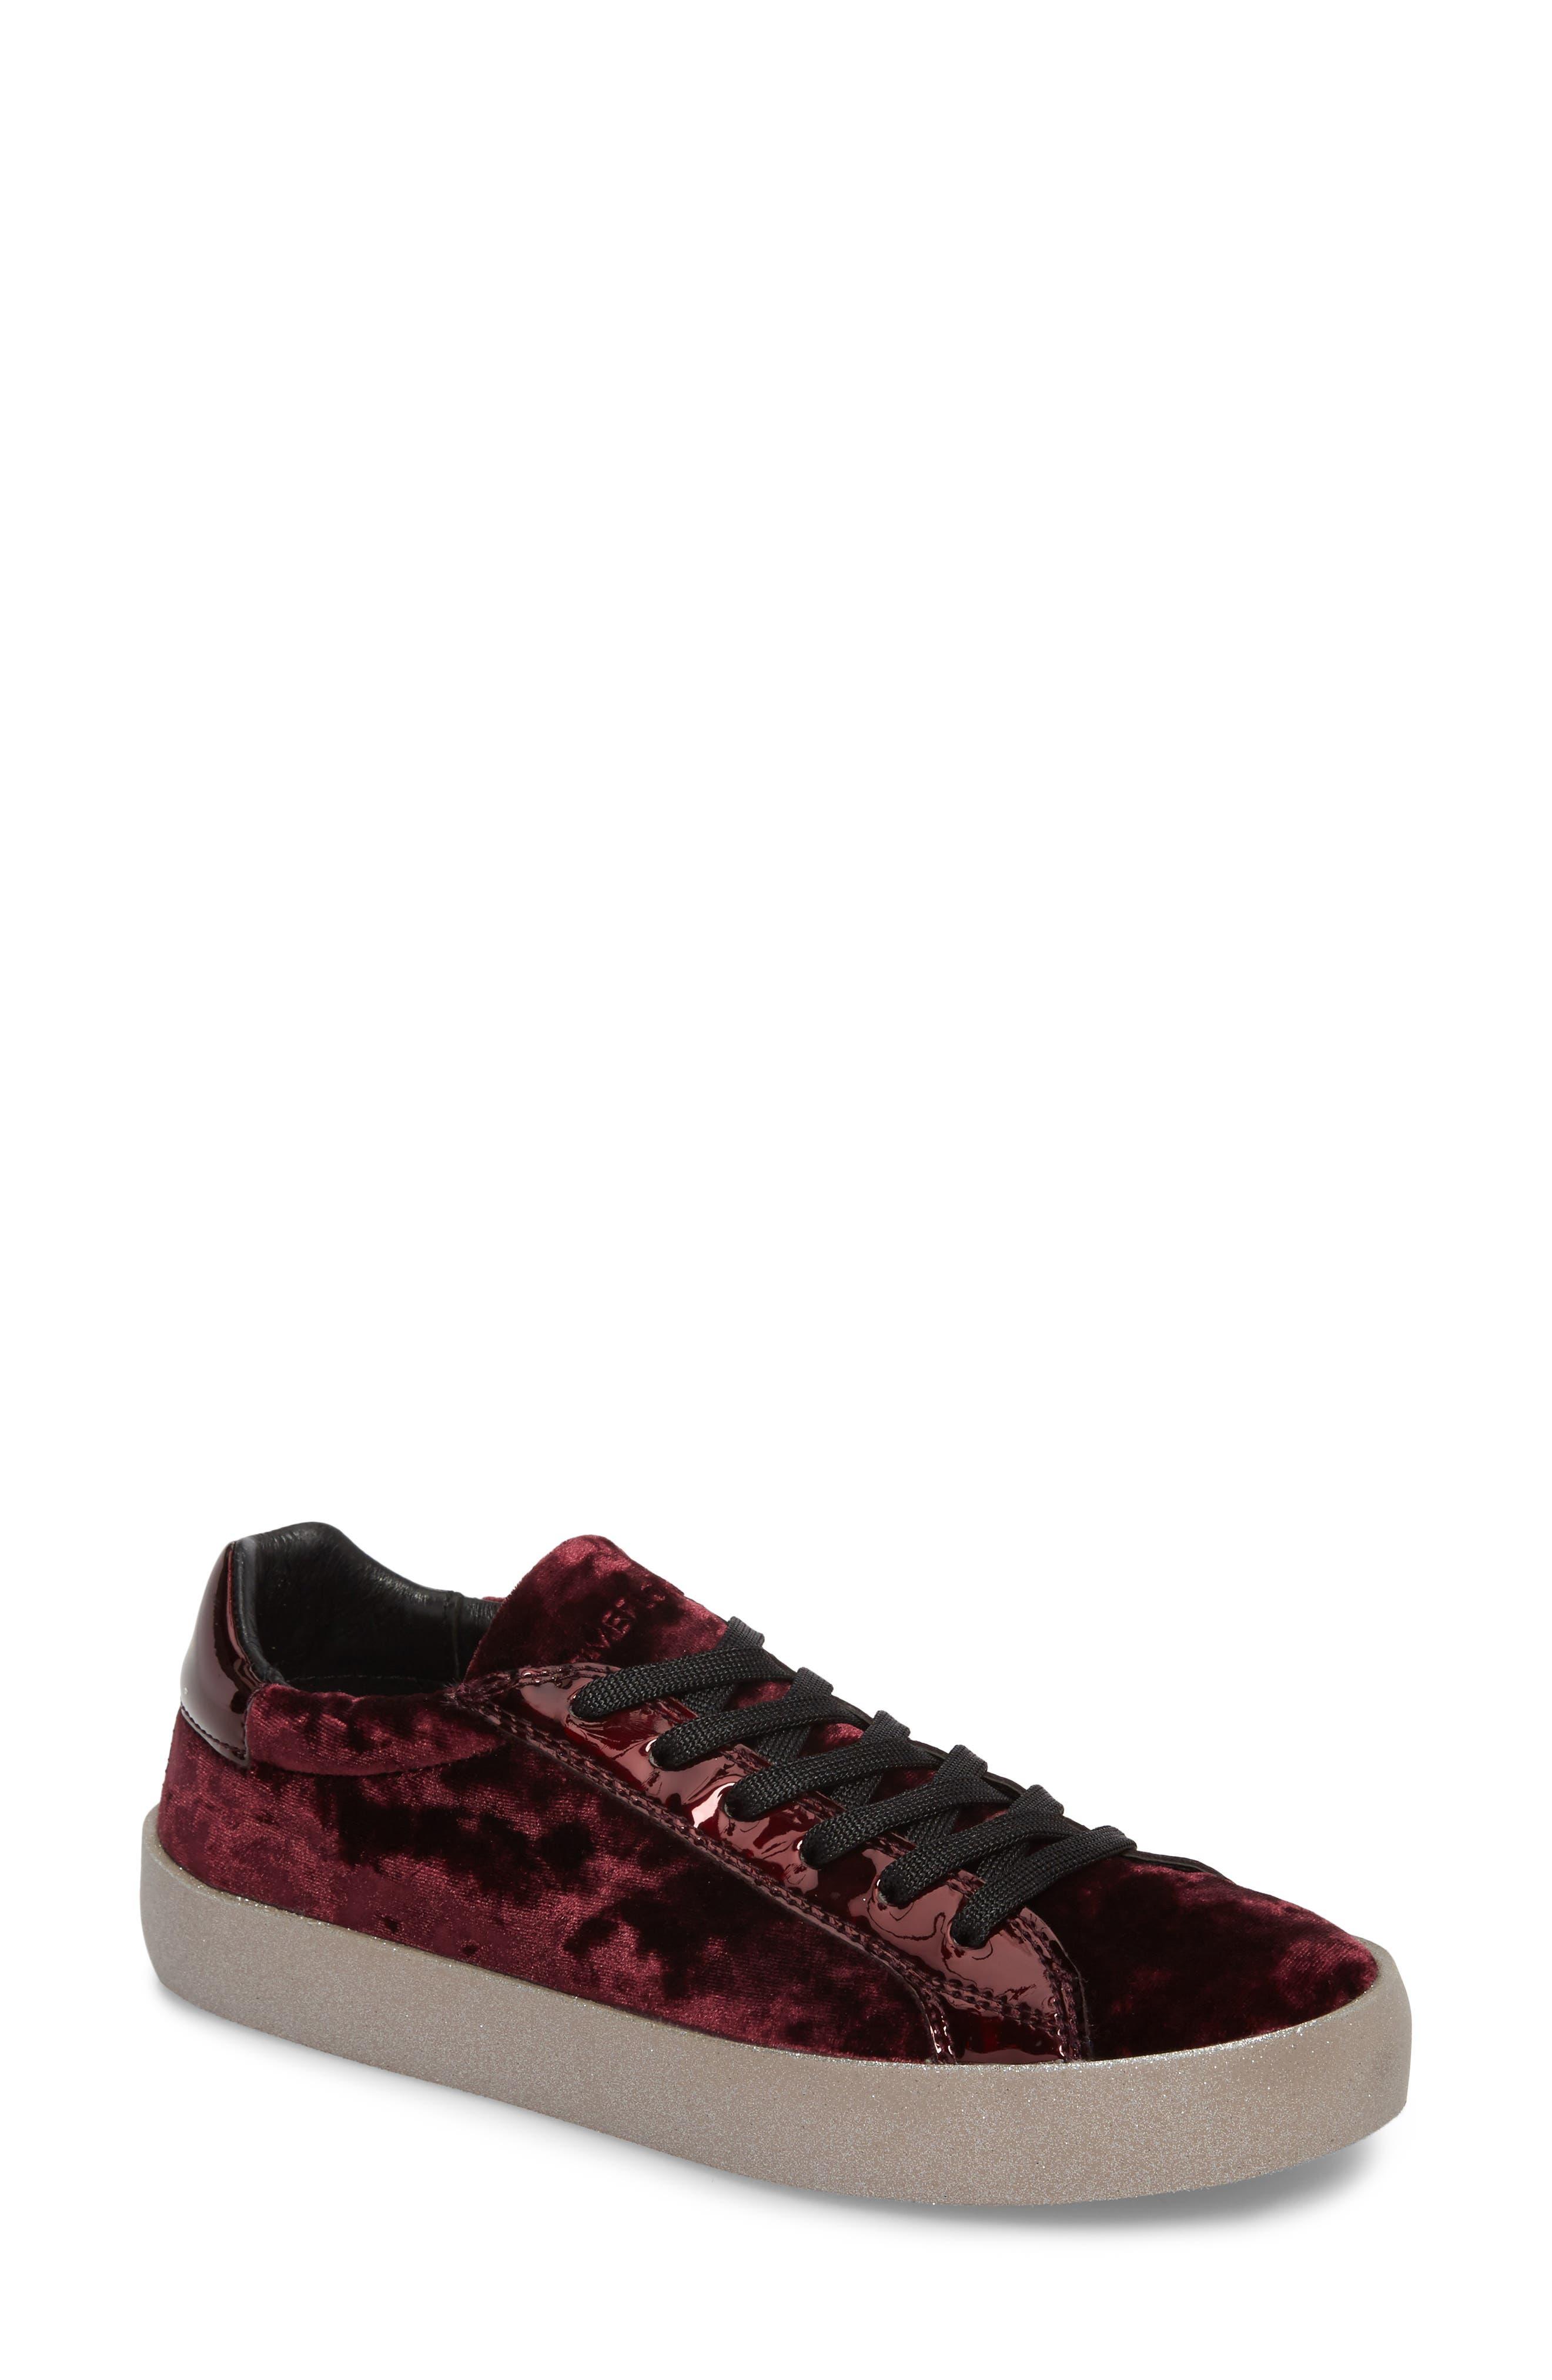 Dynamite Sneaker,                             Main thumbnail 1, color,                             Burgundy